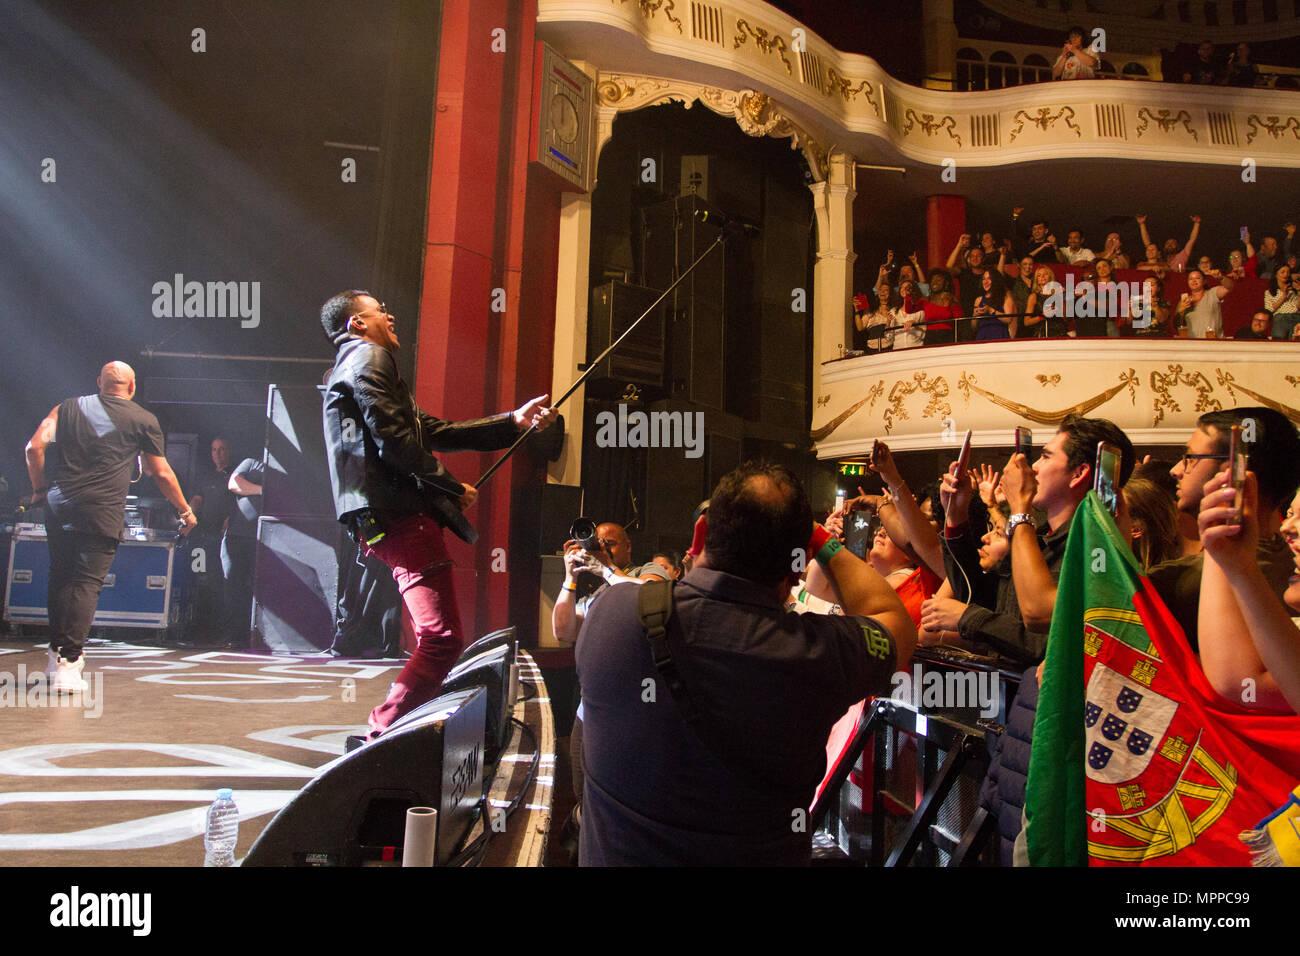 London, United Kingdom. 24 May, 2018. Gente de Zona perform in London, United Kingdom. Credit: Brayan Lopez/Alamy Live News. Stock Photo